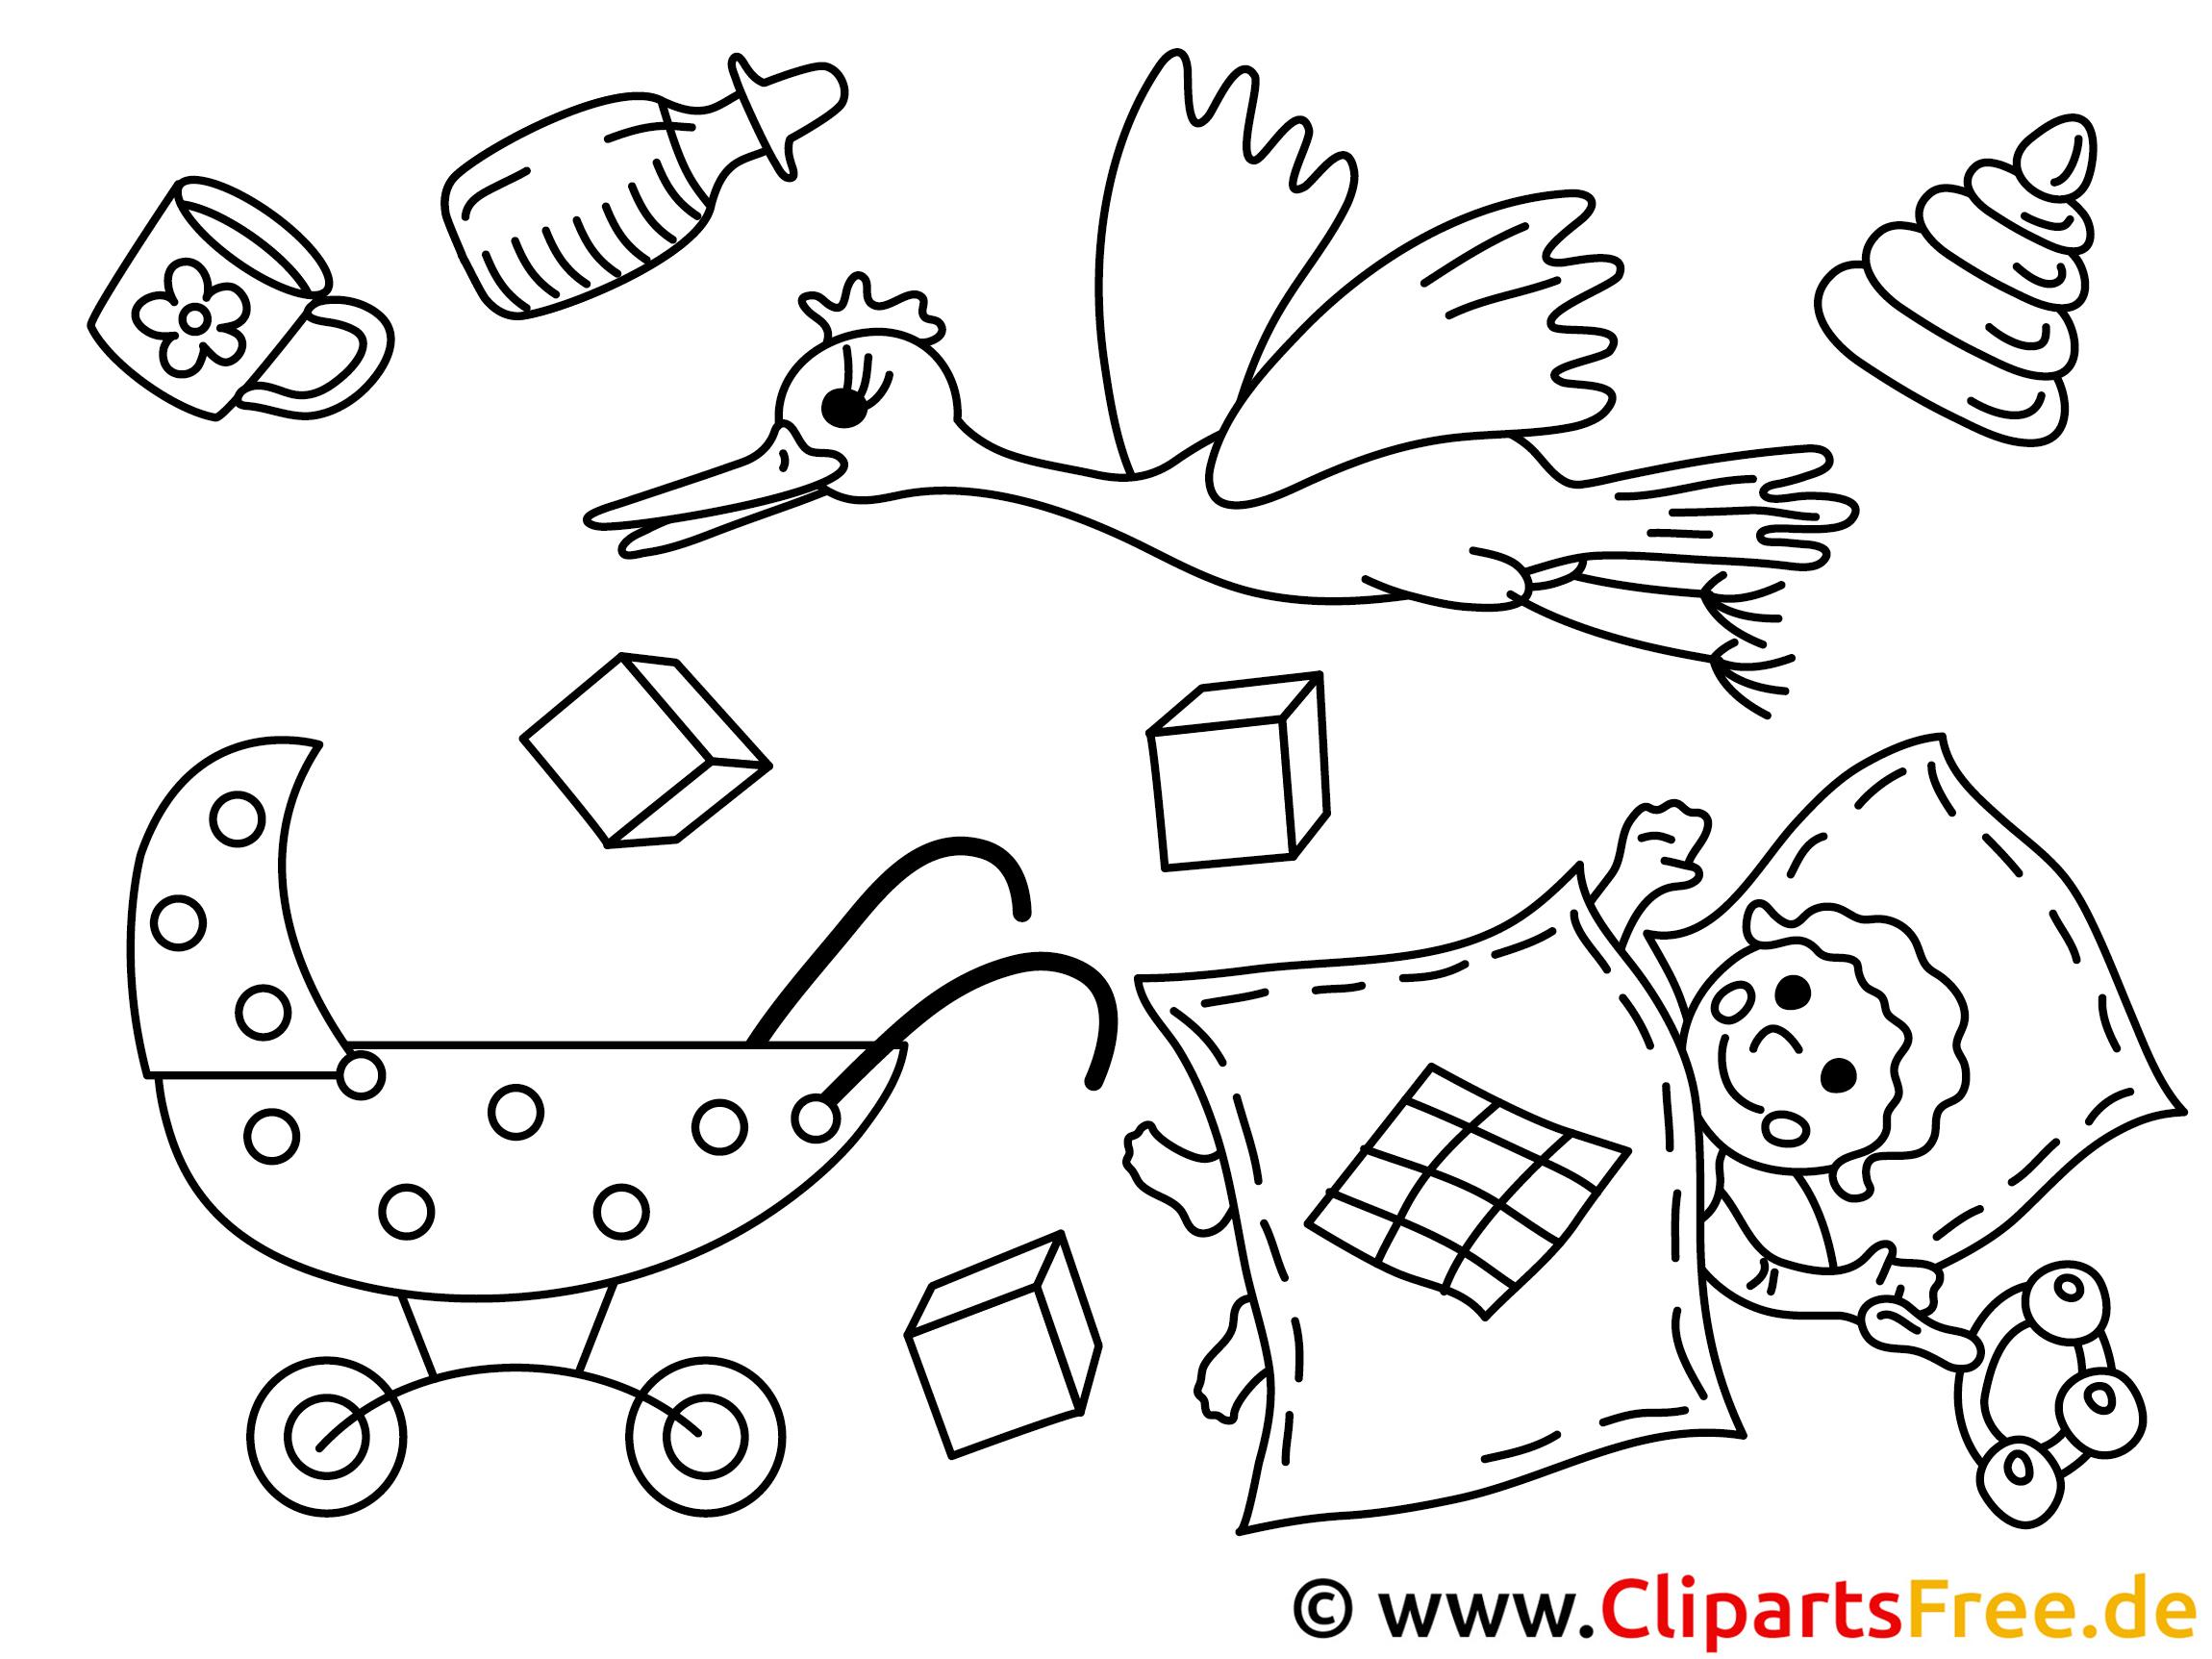 Großzügig Kindergartenbilder Zum Ausmalen Ideen - Framing ...